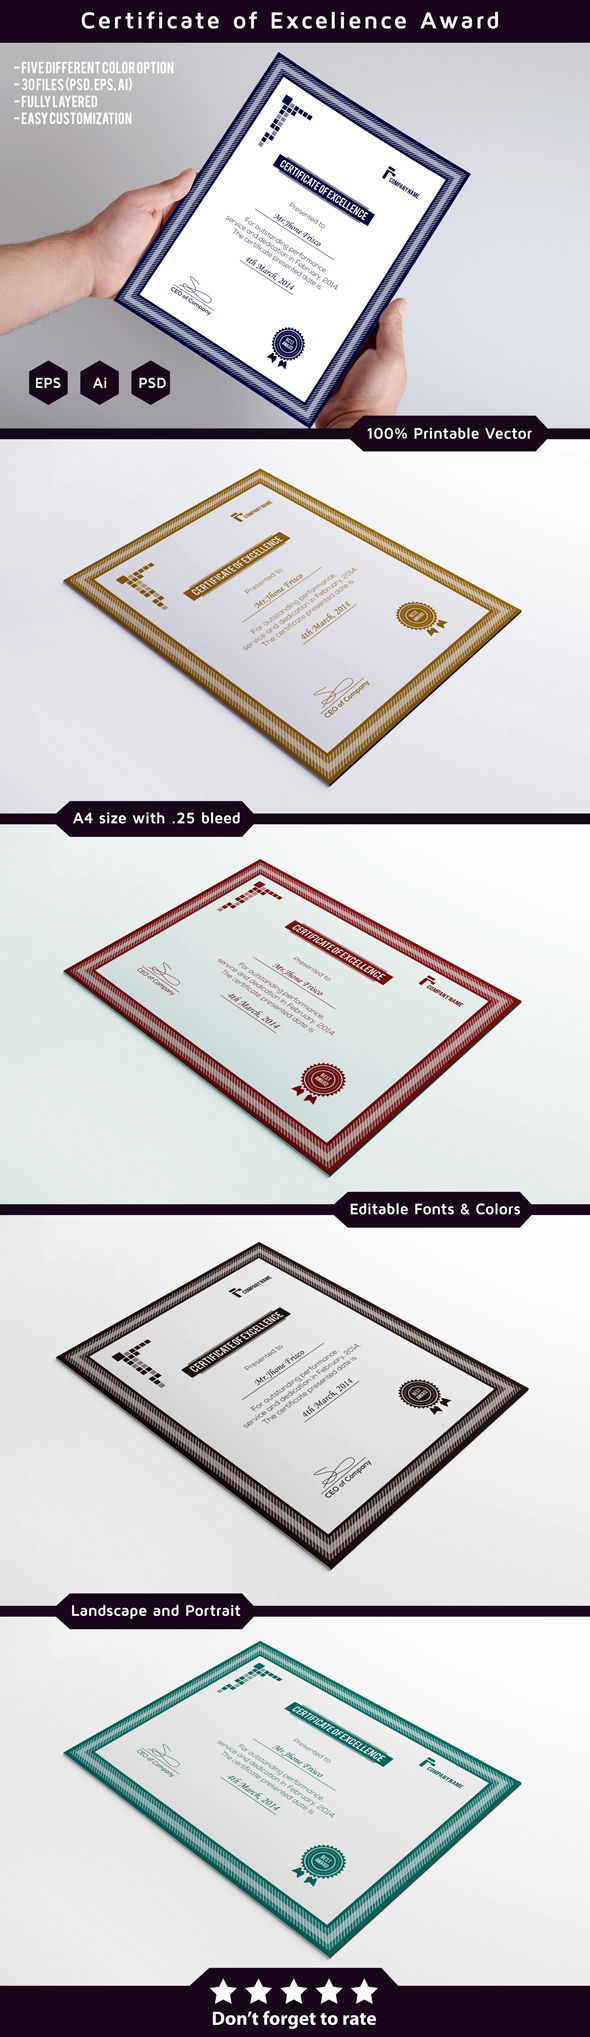 Award Certificate Template  Ksu Awards Banquet